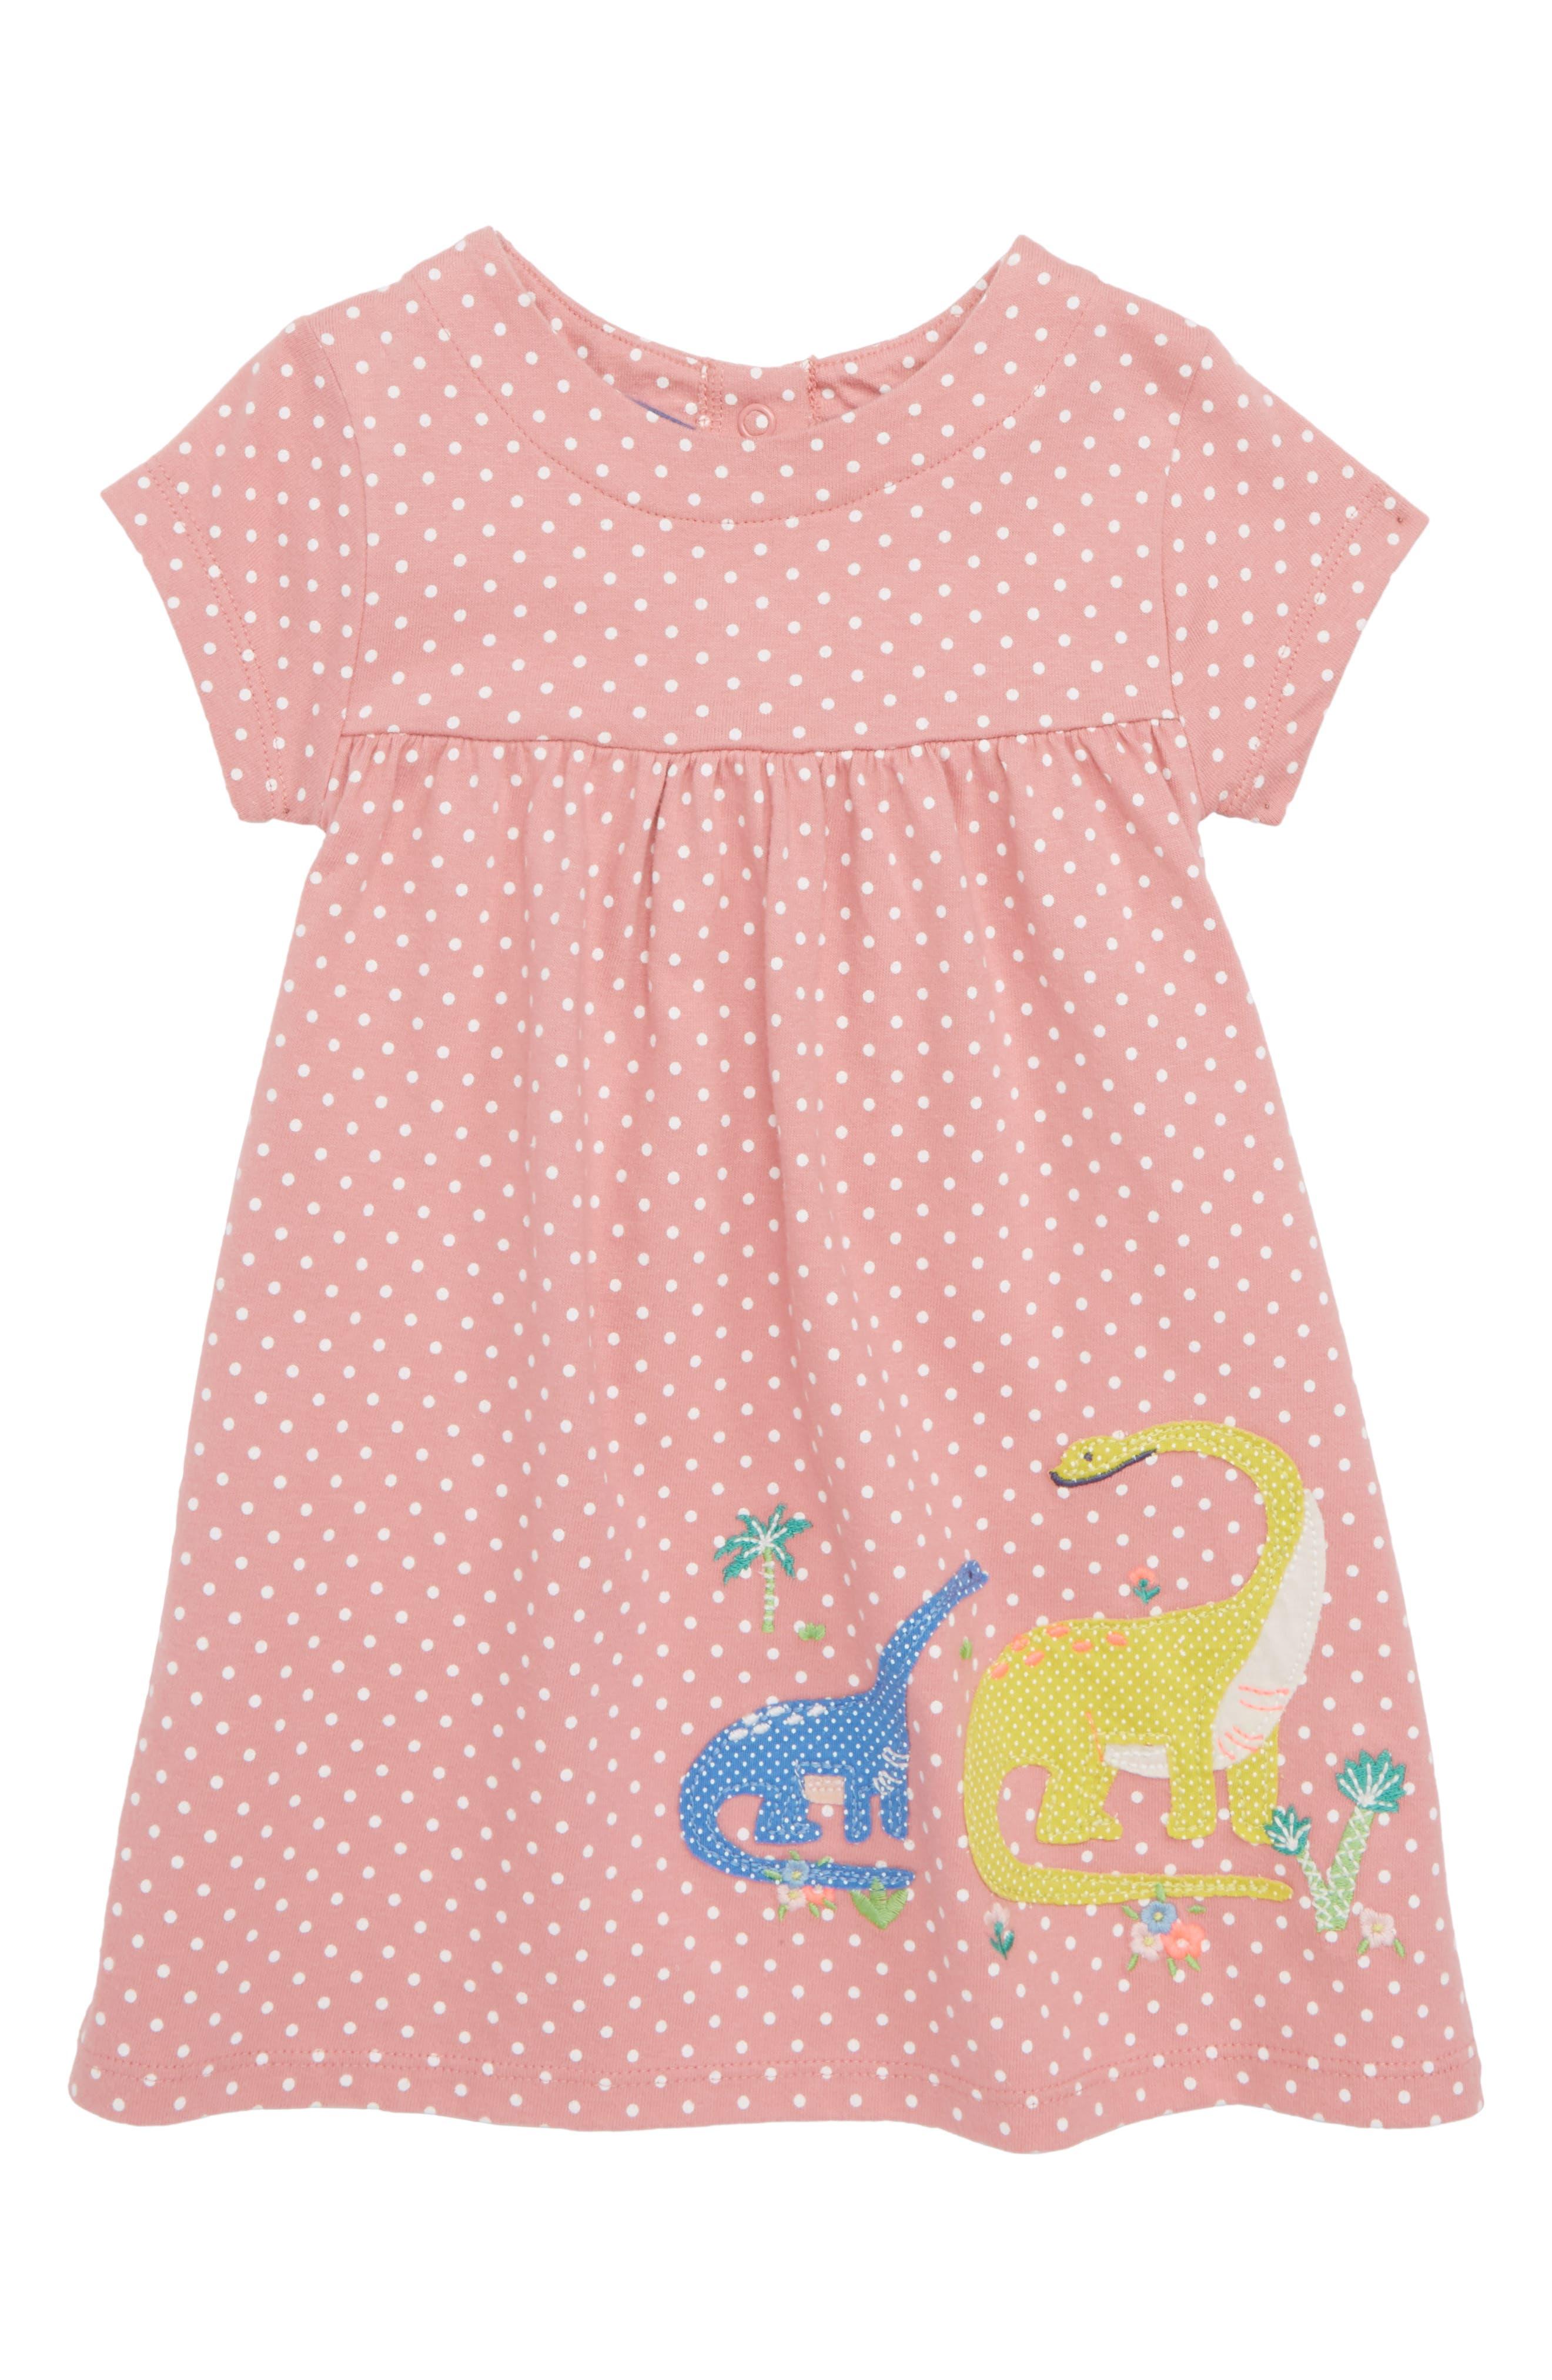 Dinosaur Appliqué Jersey Dress,                         Main,                         color, Light Rose/ Pink